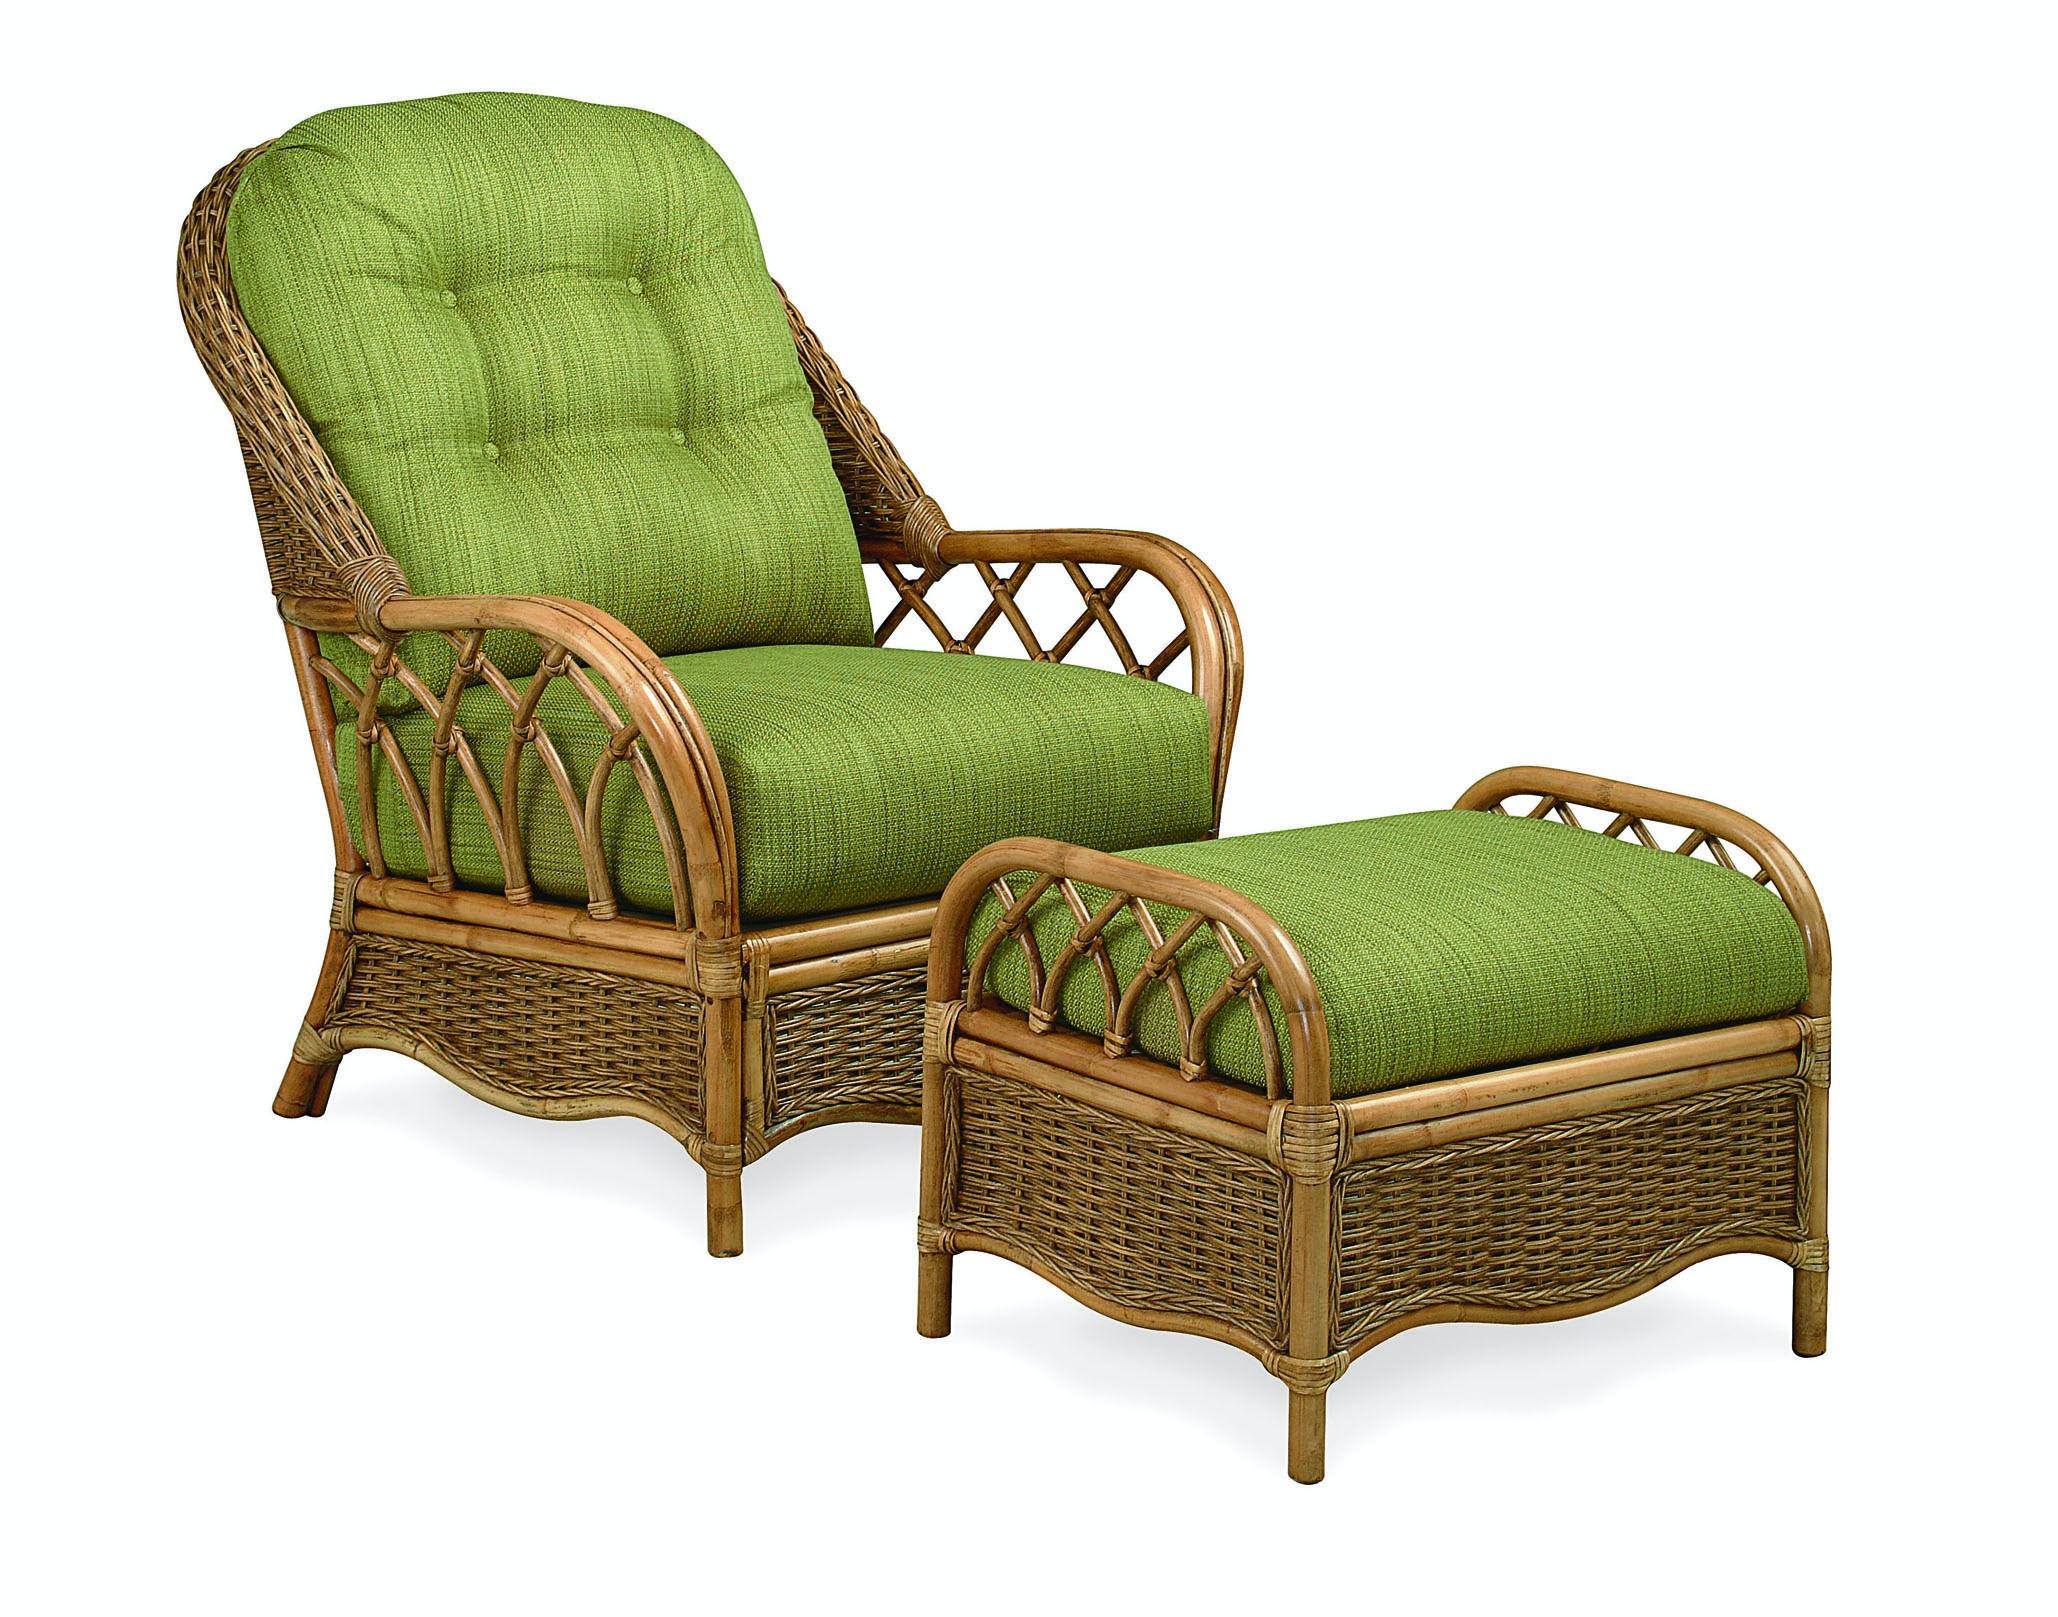 Charmant Braxton Culler Living Room Ottoman 905 009   LA Waters Furniture    Statesboro, GA